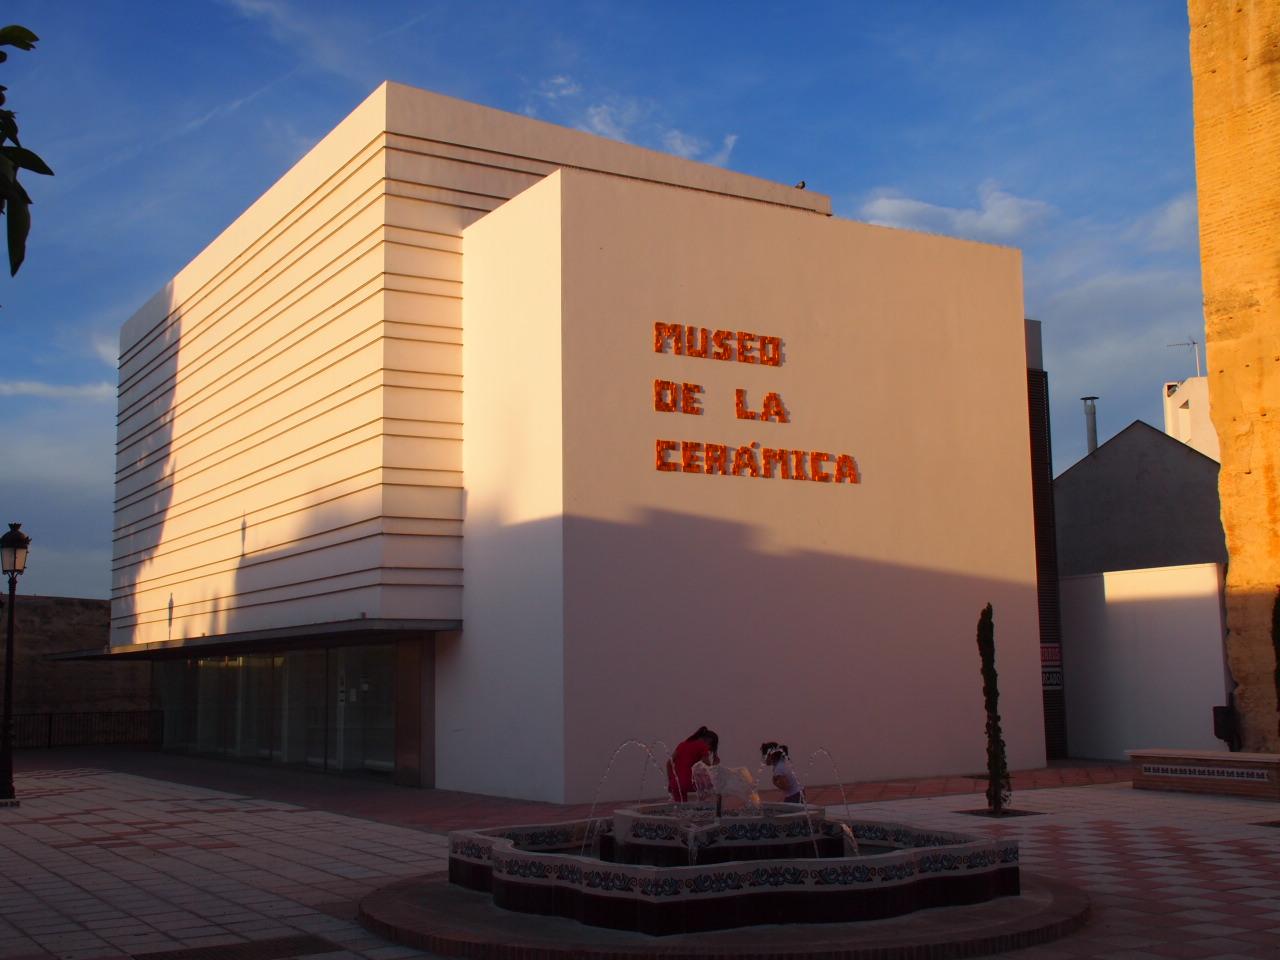 Museo de la Cerámica de La Rambla